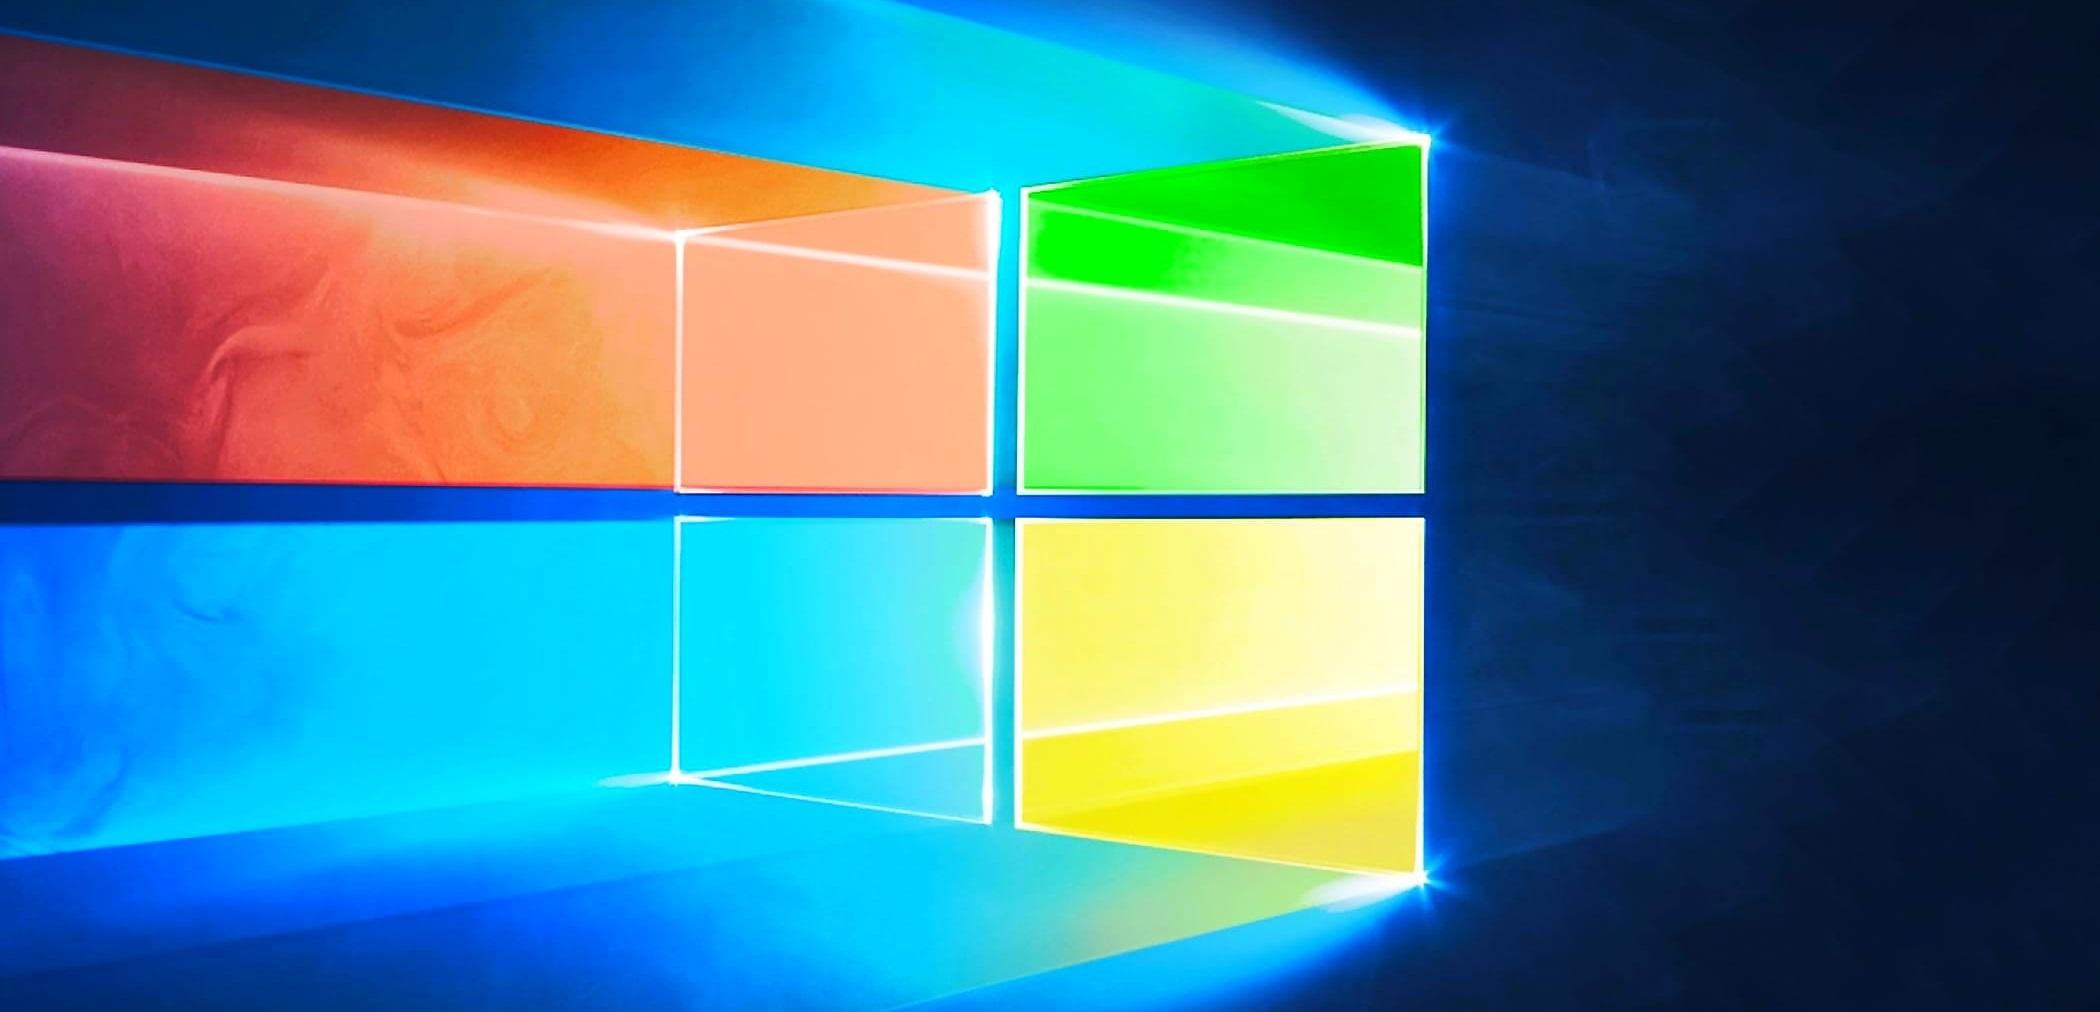 200935-Windows-10-Microsoft.jpg